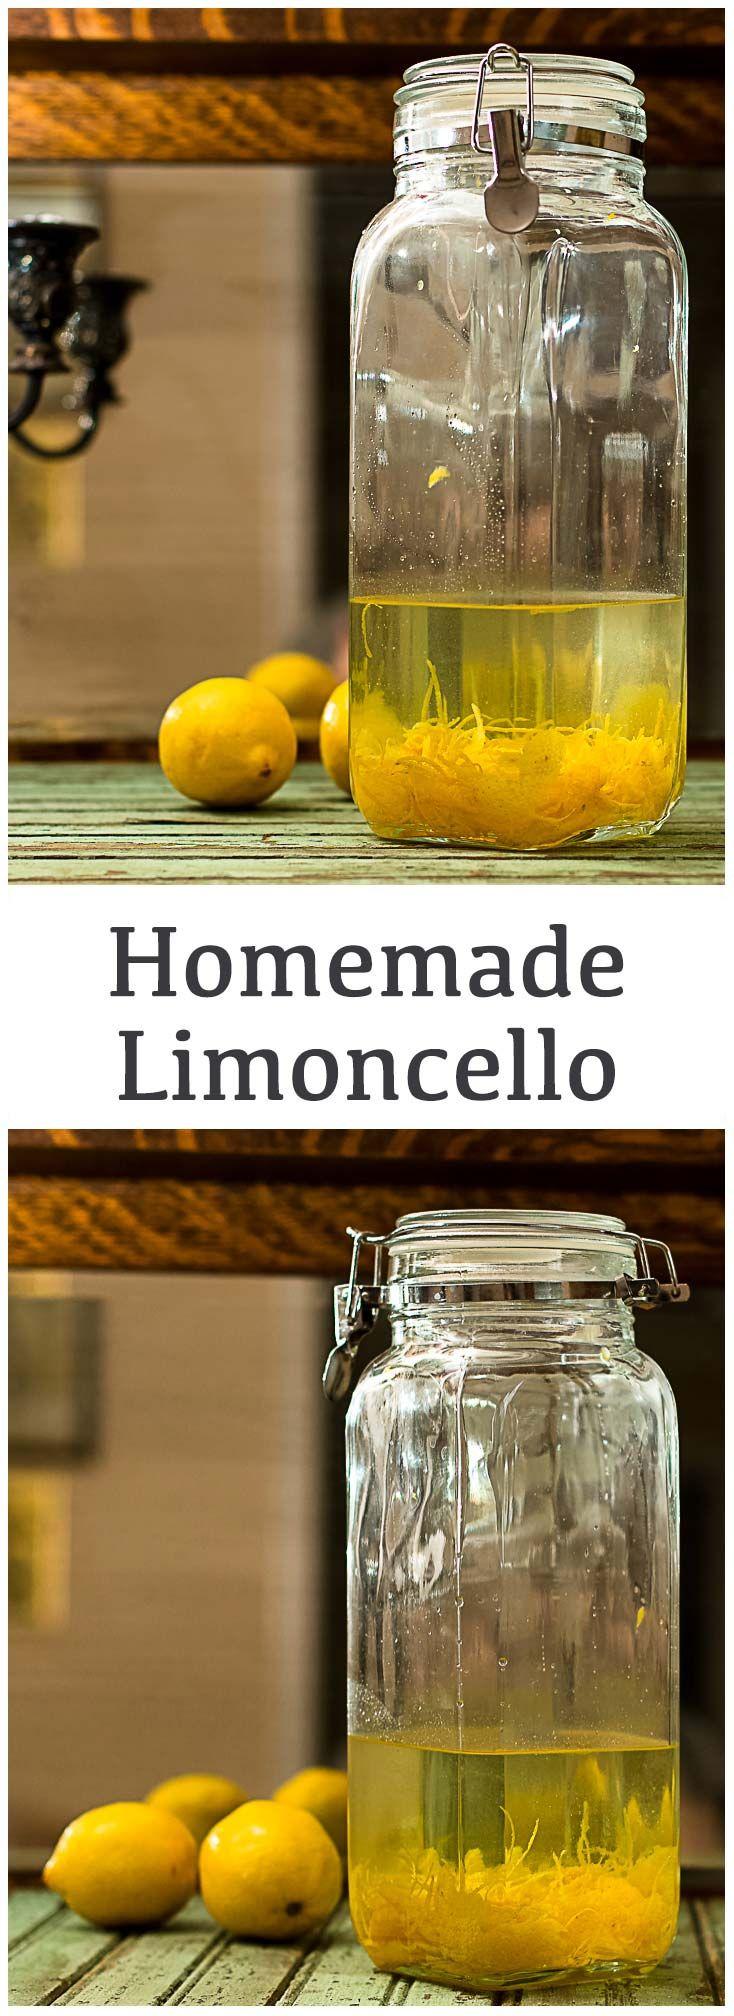 Homemade Limoncello!  #Vodka #infusions #limoncello